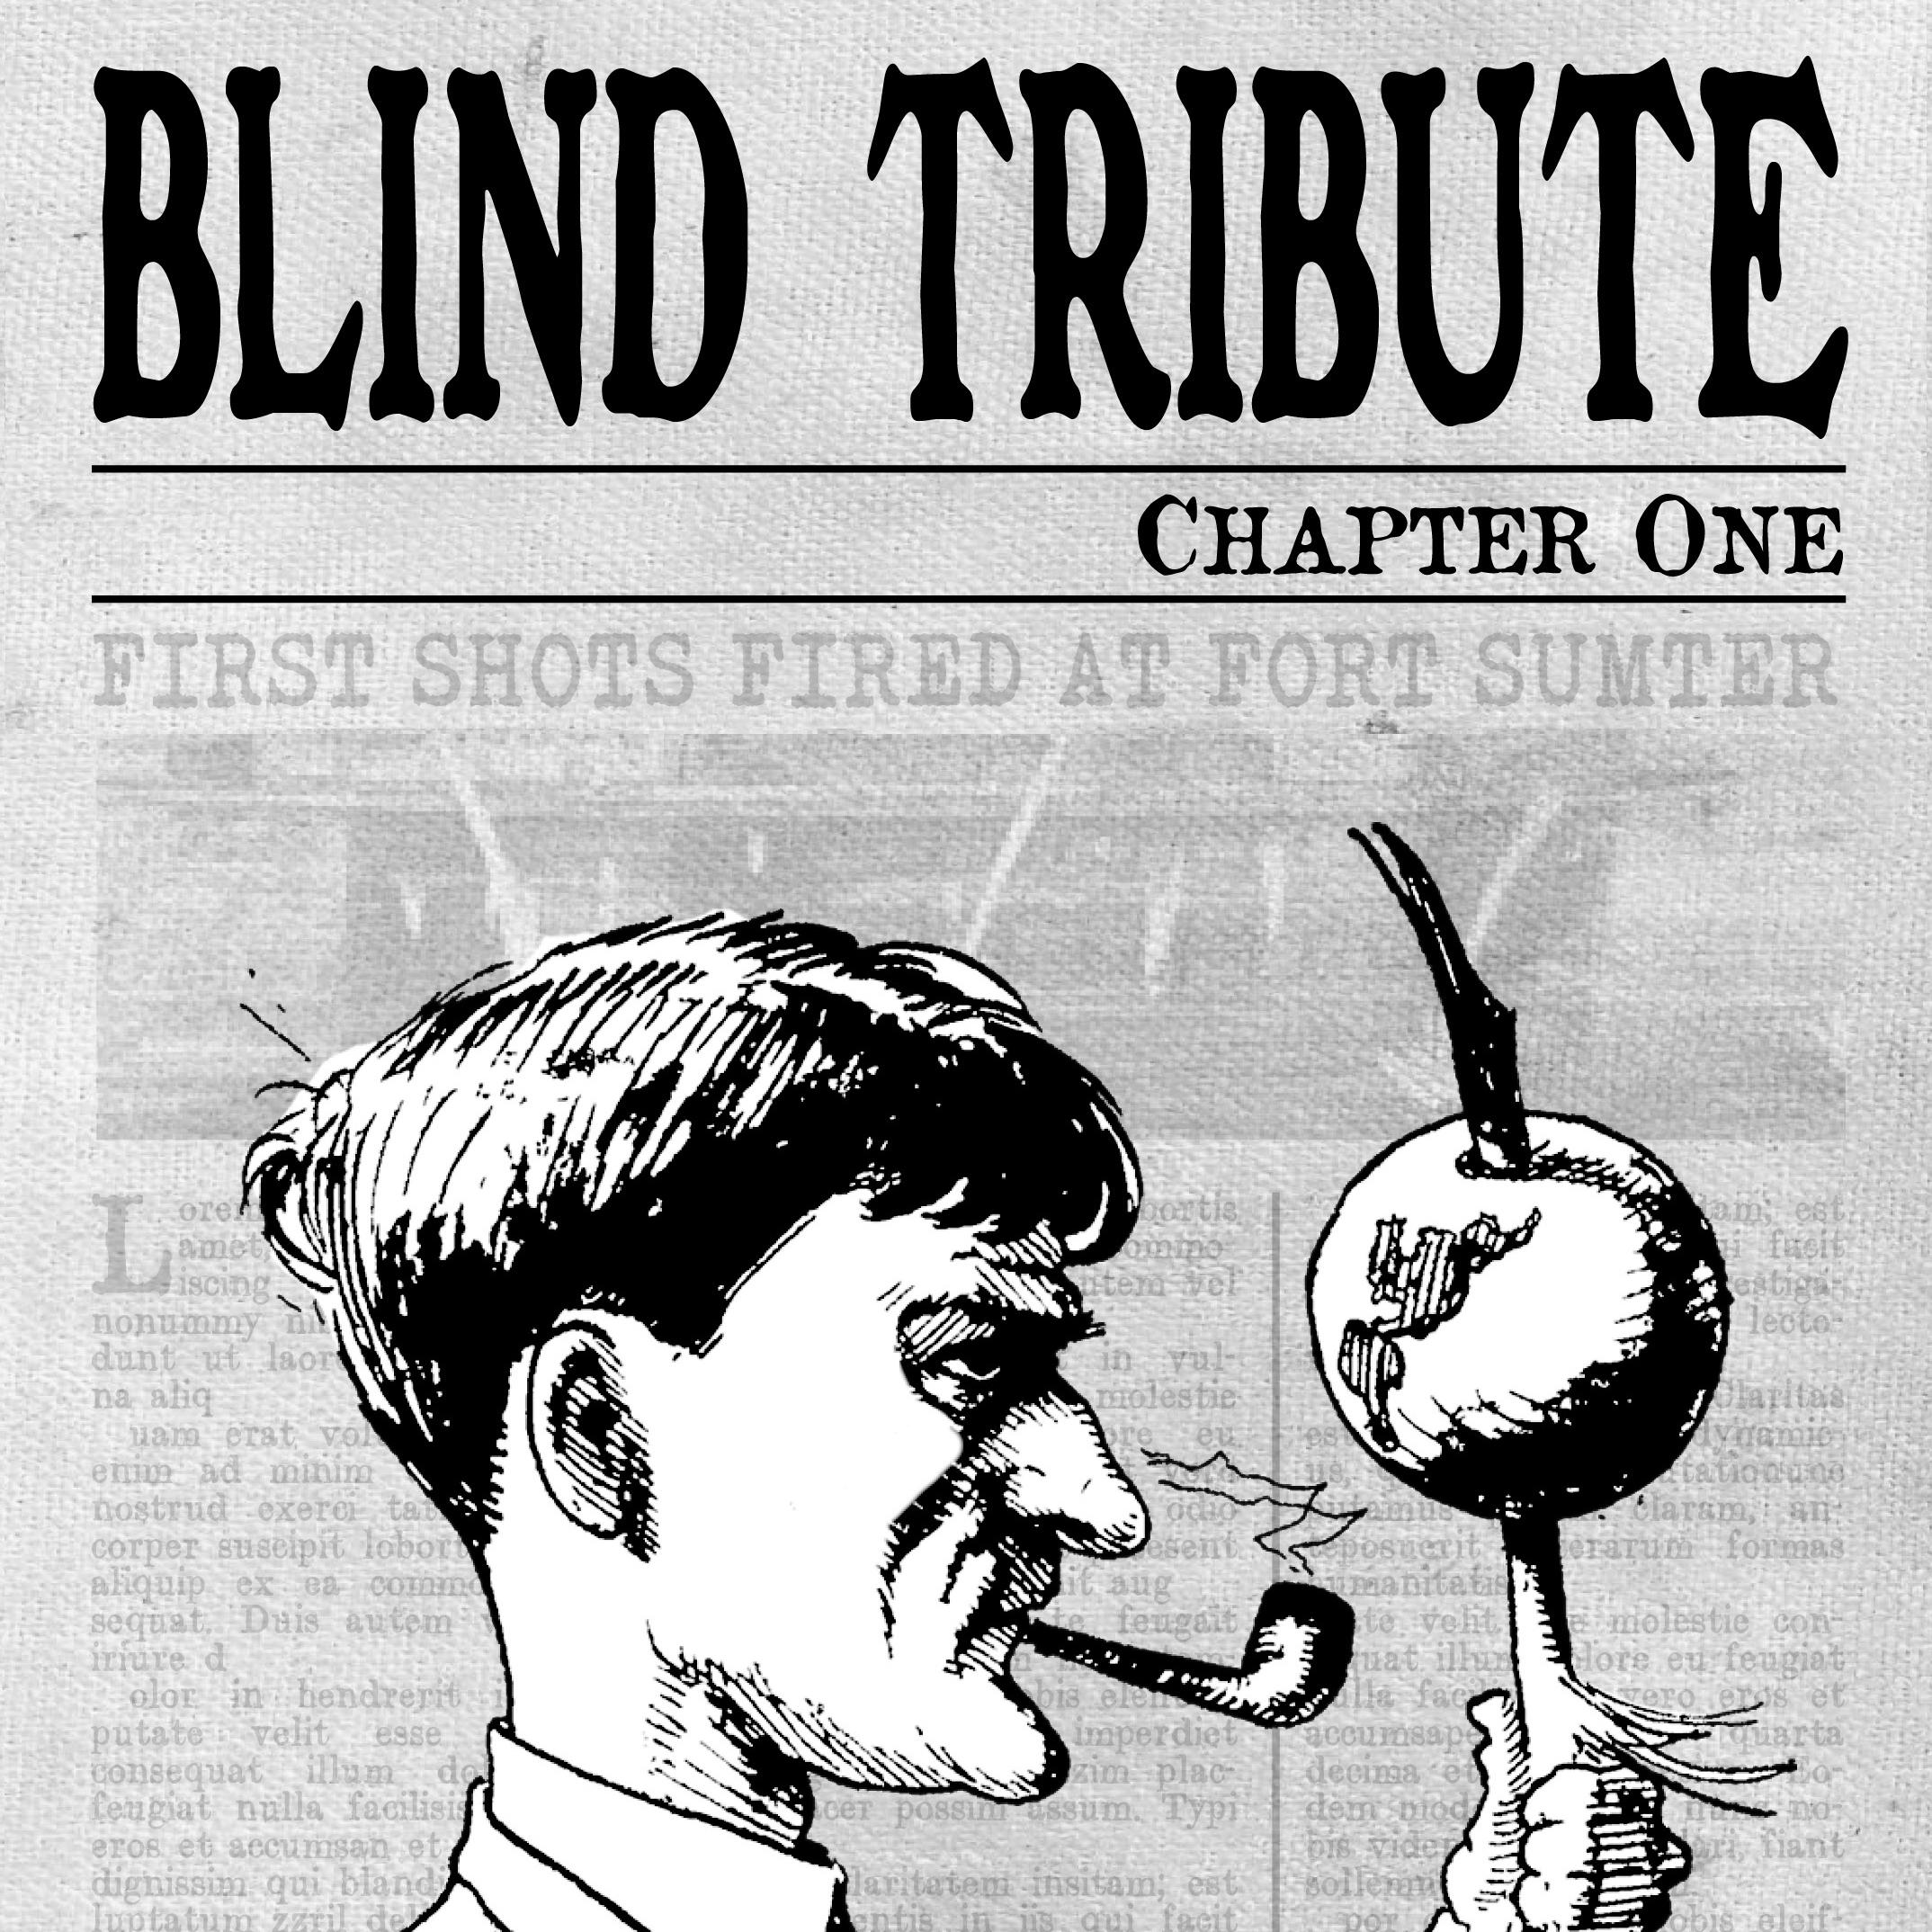 Blind Tribute